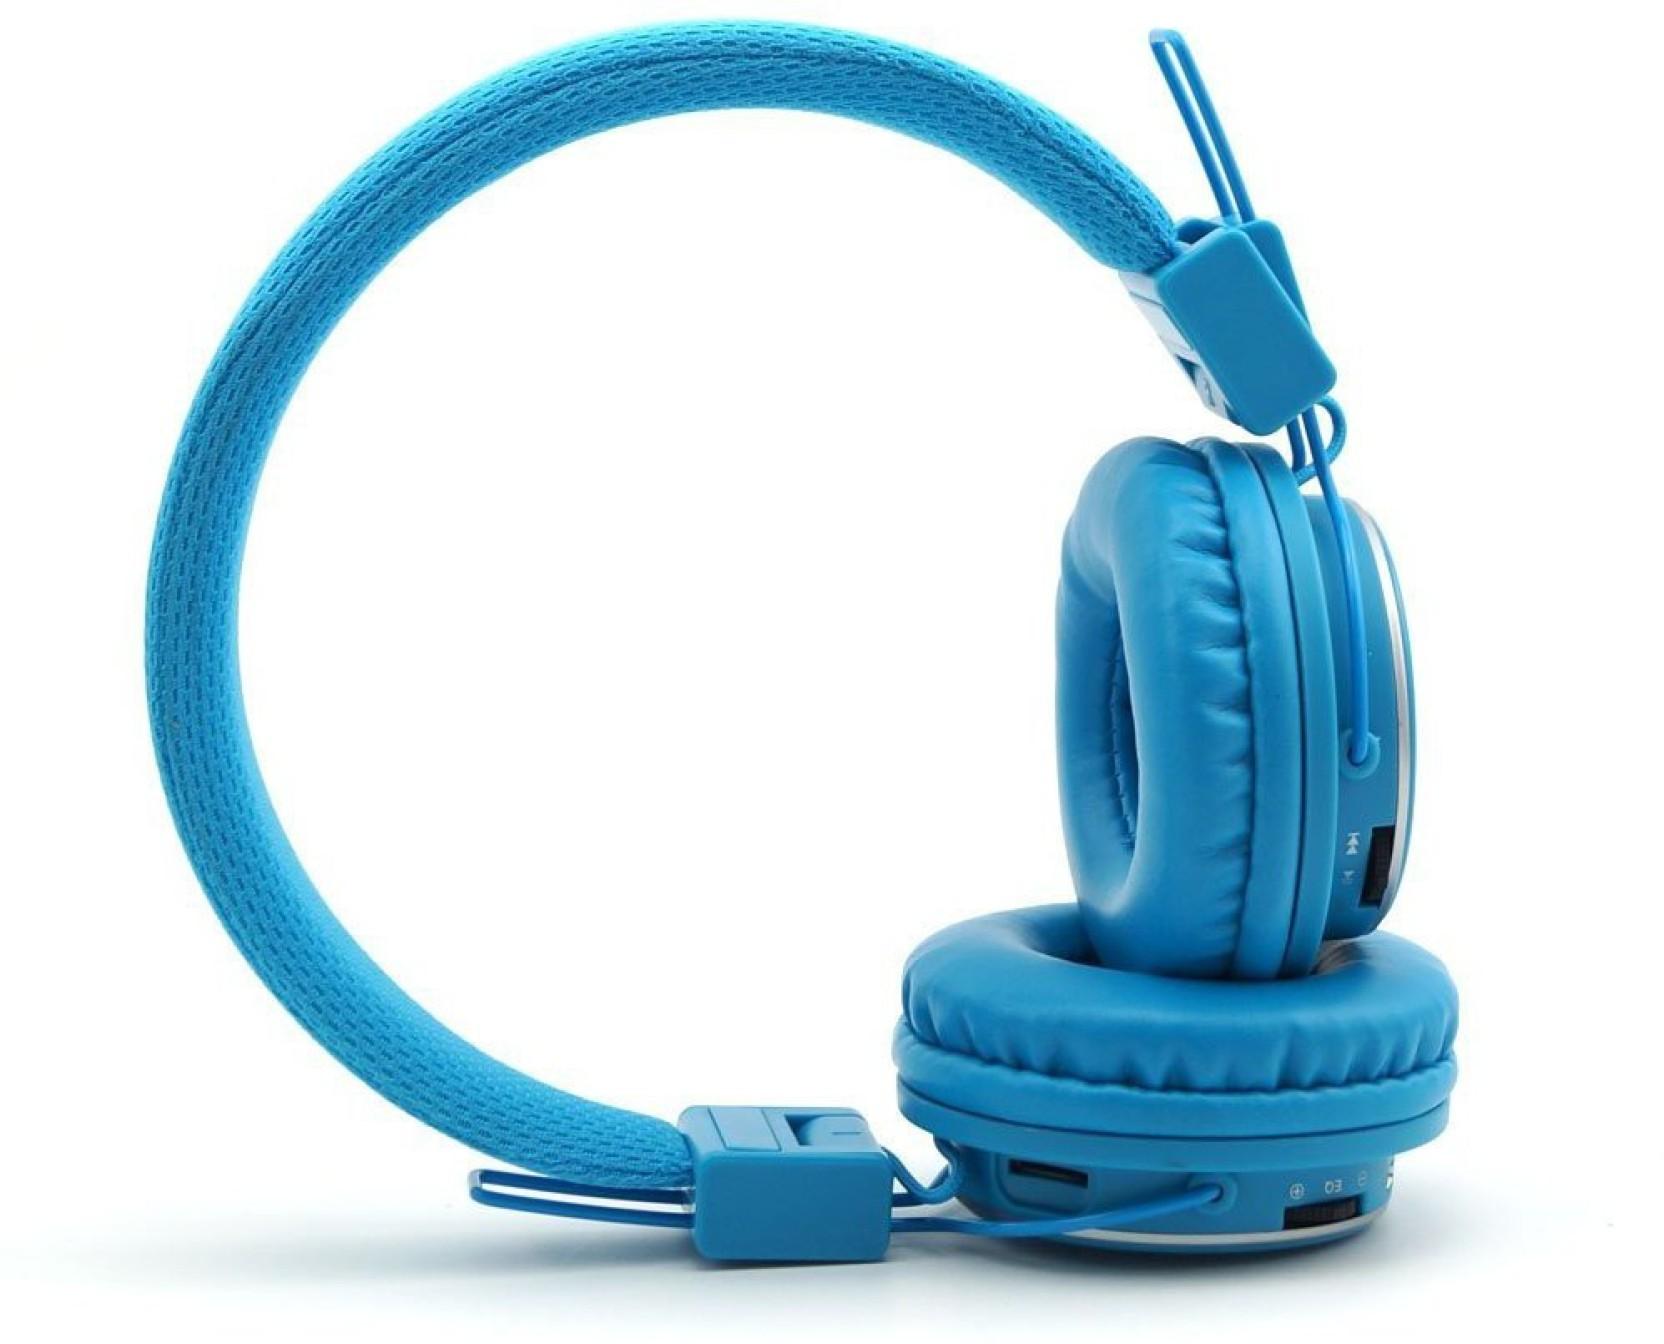 NIA 1682 Headphone Price in India - Buy NIA 1682 Headphone Online ...